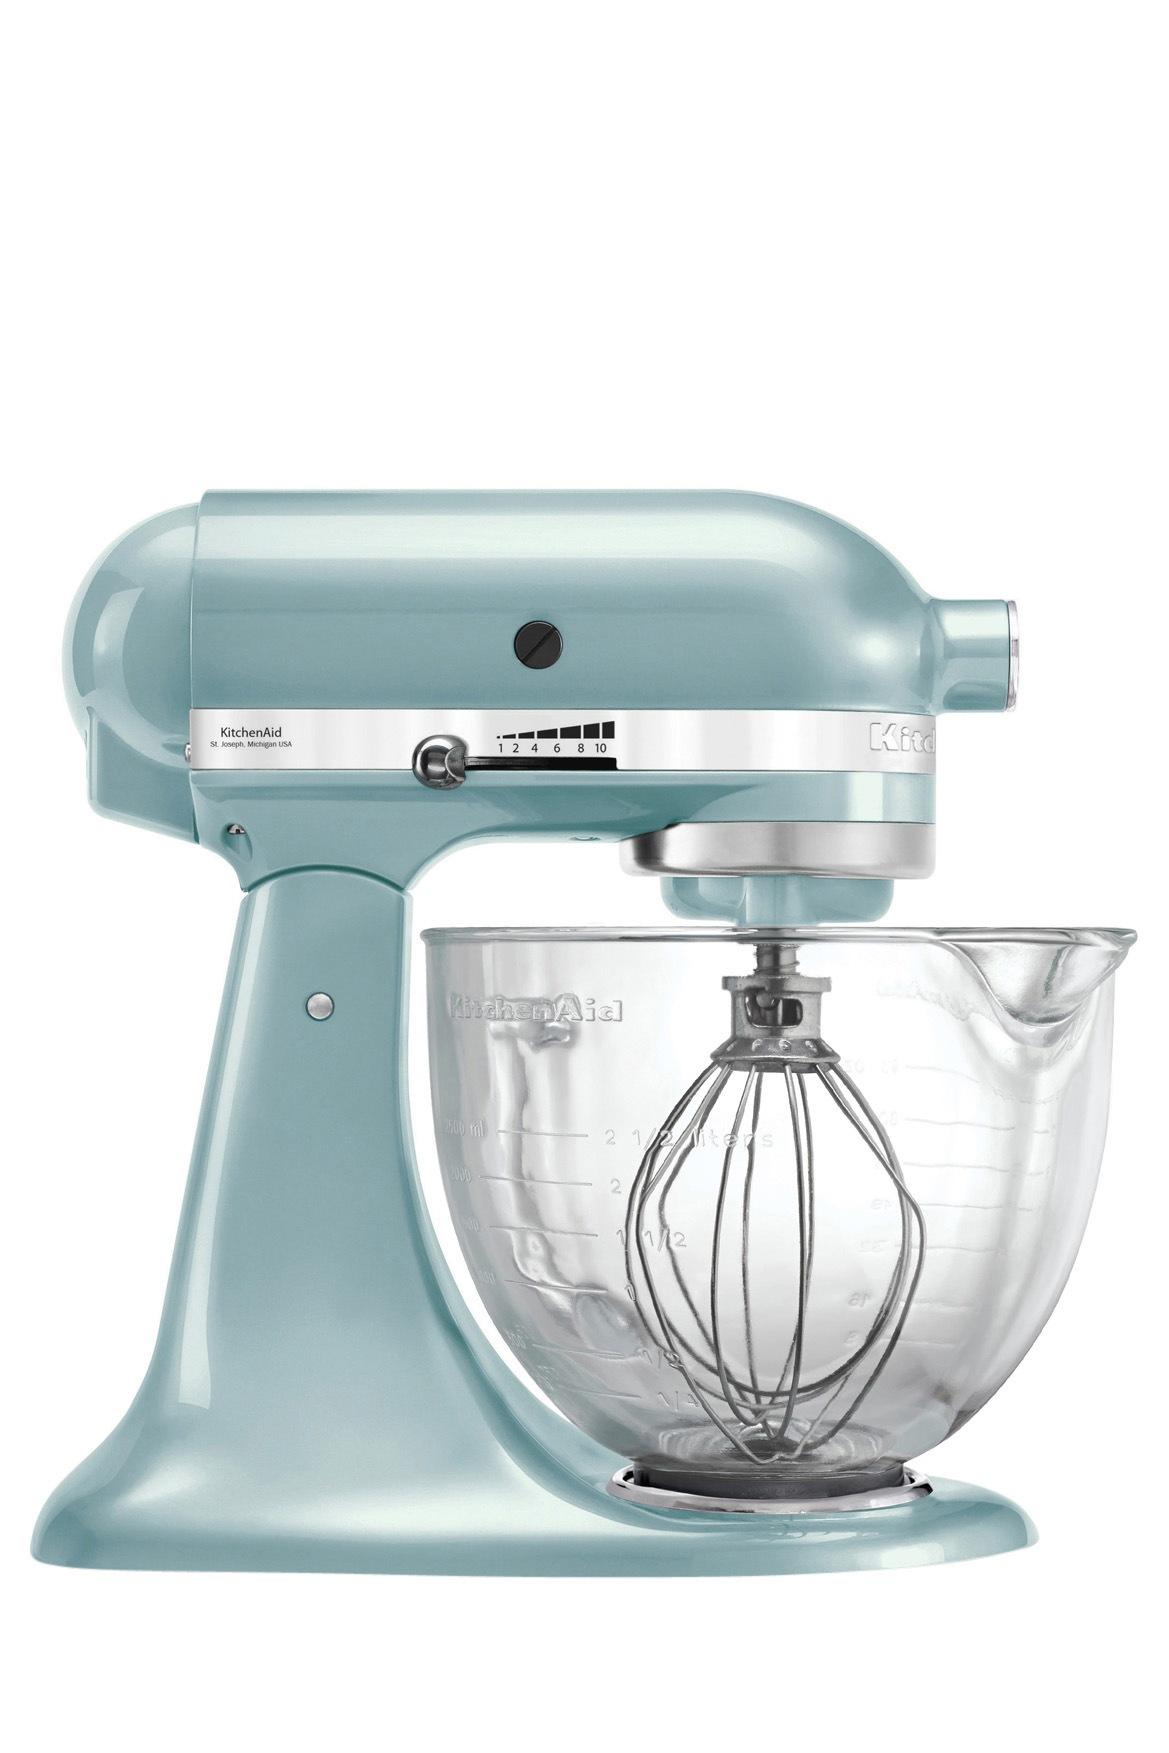 KitchenAid   KSM170 Stand Mixer: Azure Blue   Myer Online